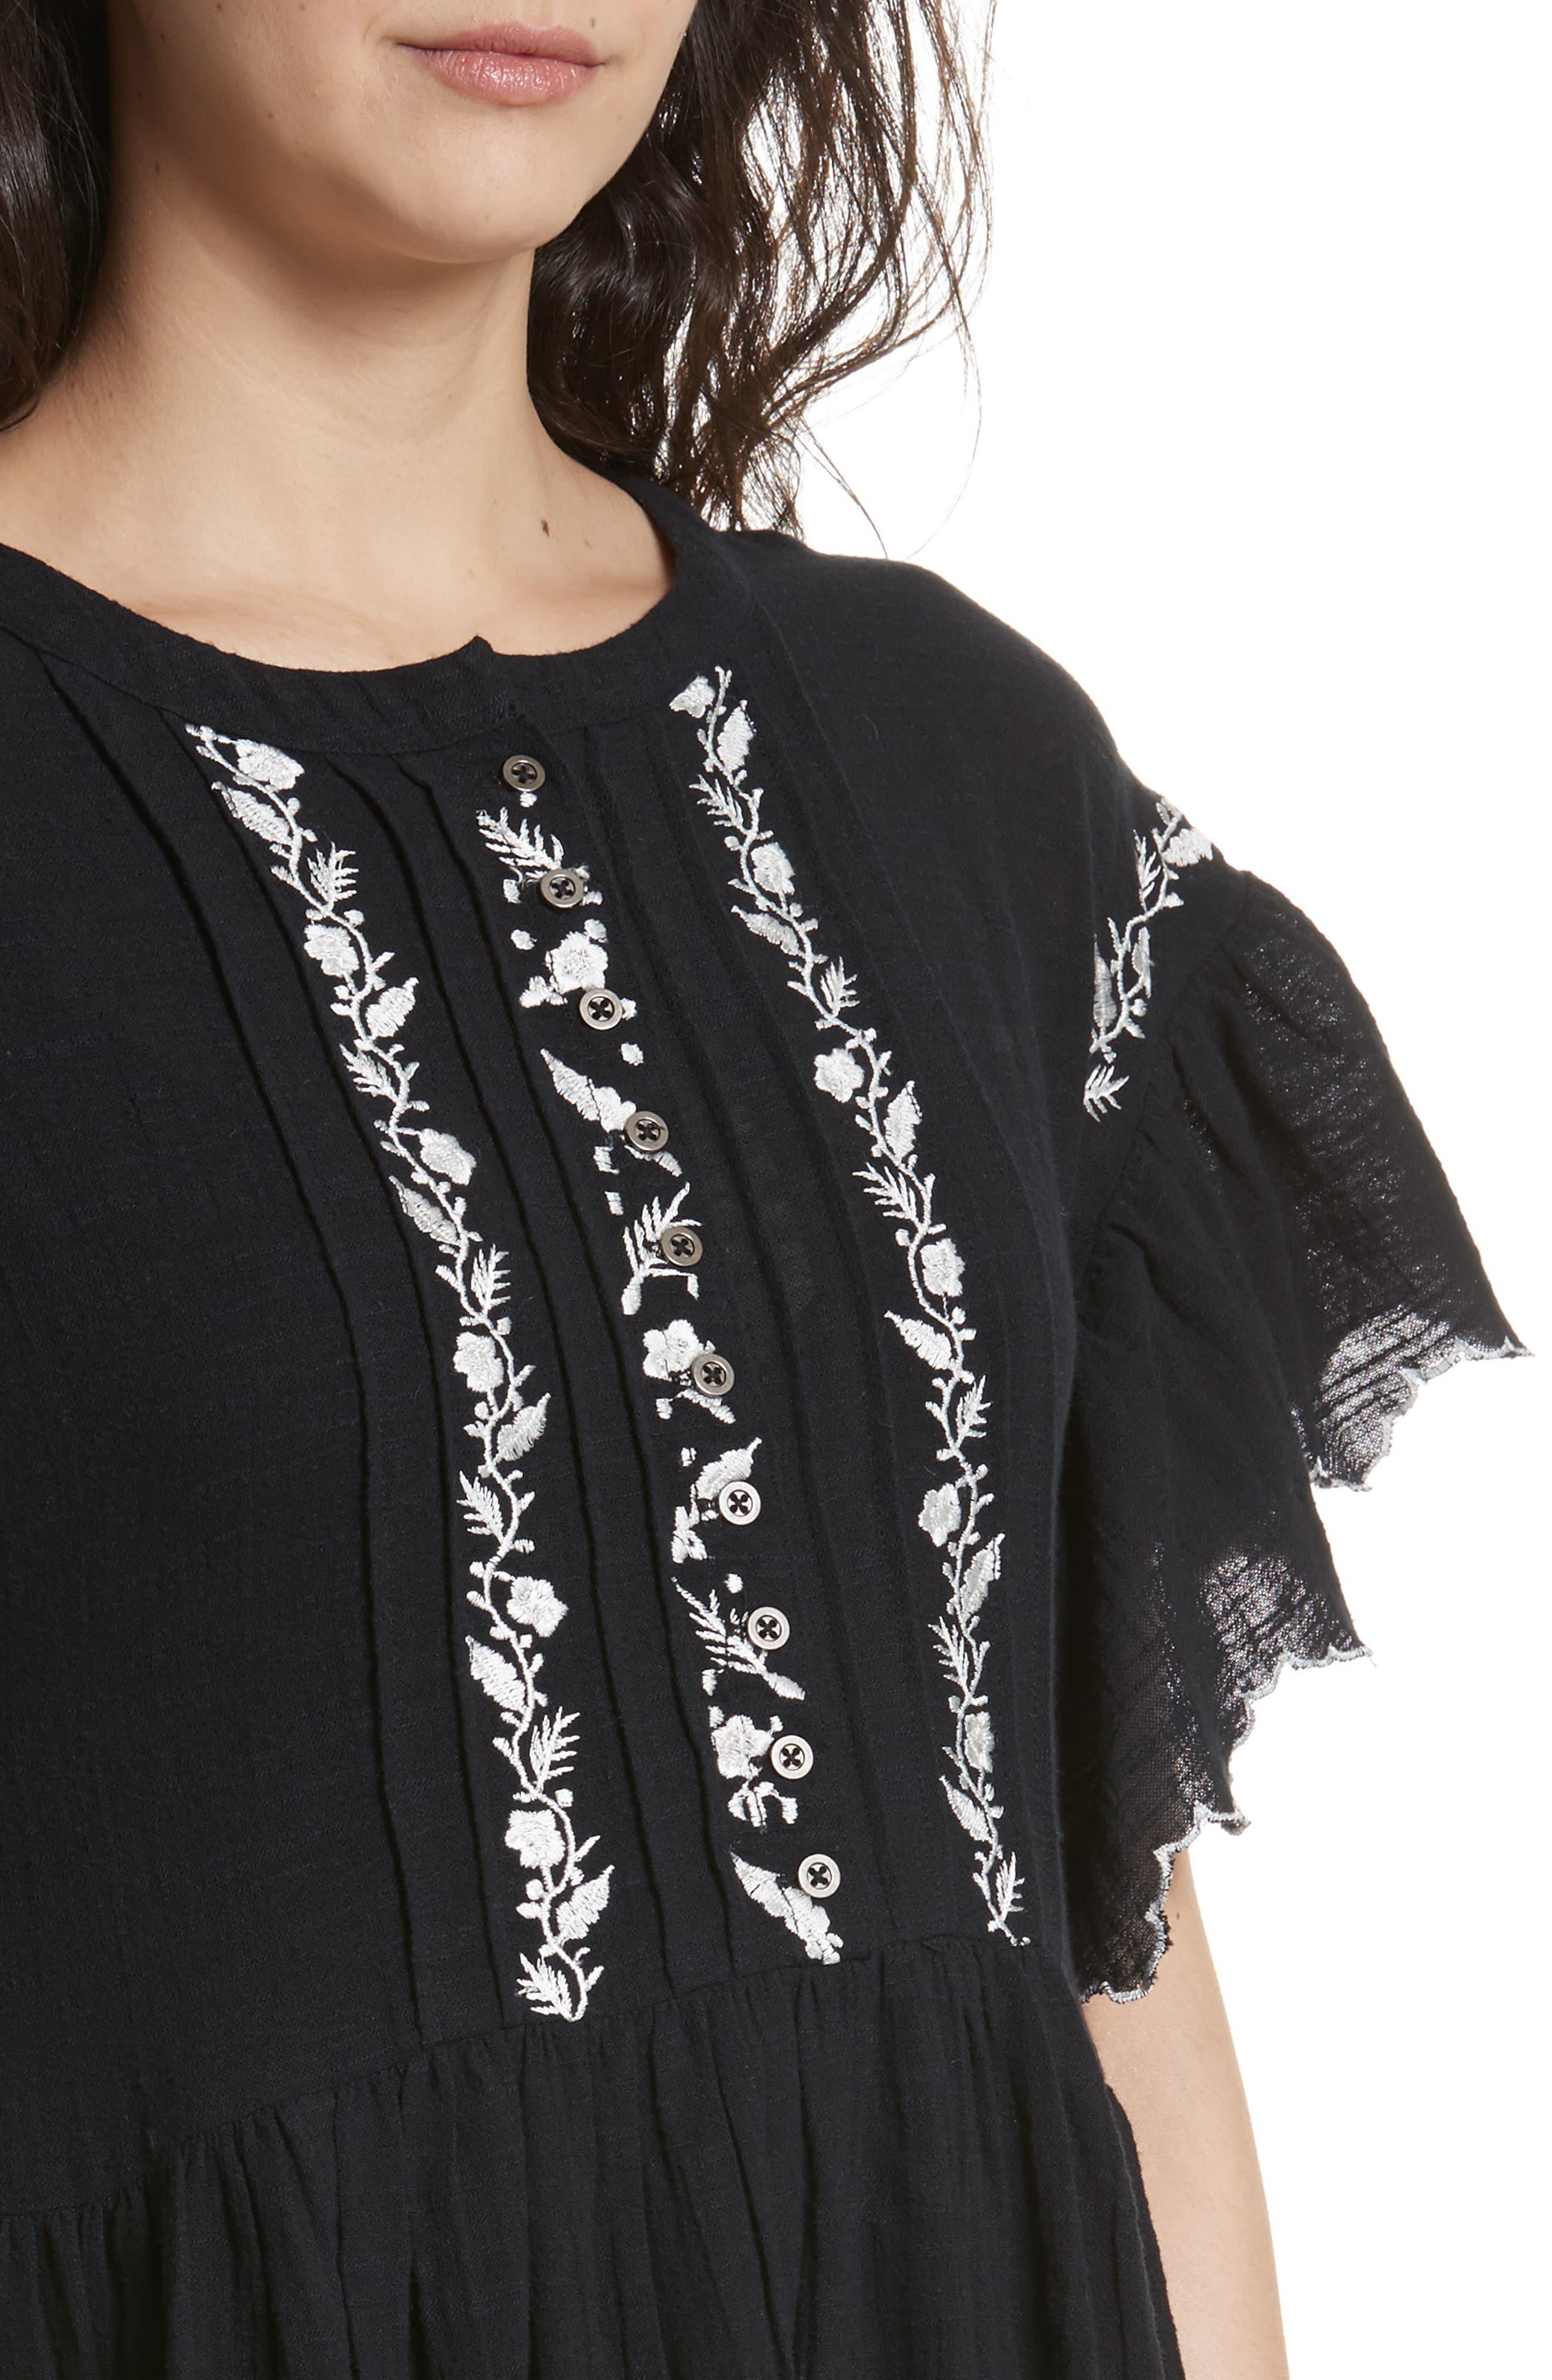 Santiago Embroidered Minidress,                             Alternate thumbnail 4, color,                             Black